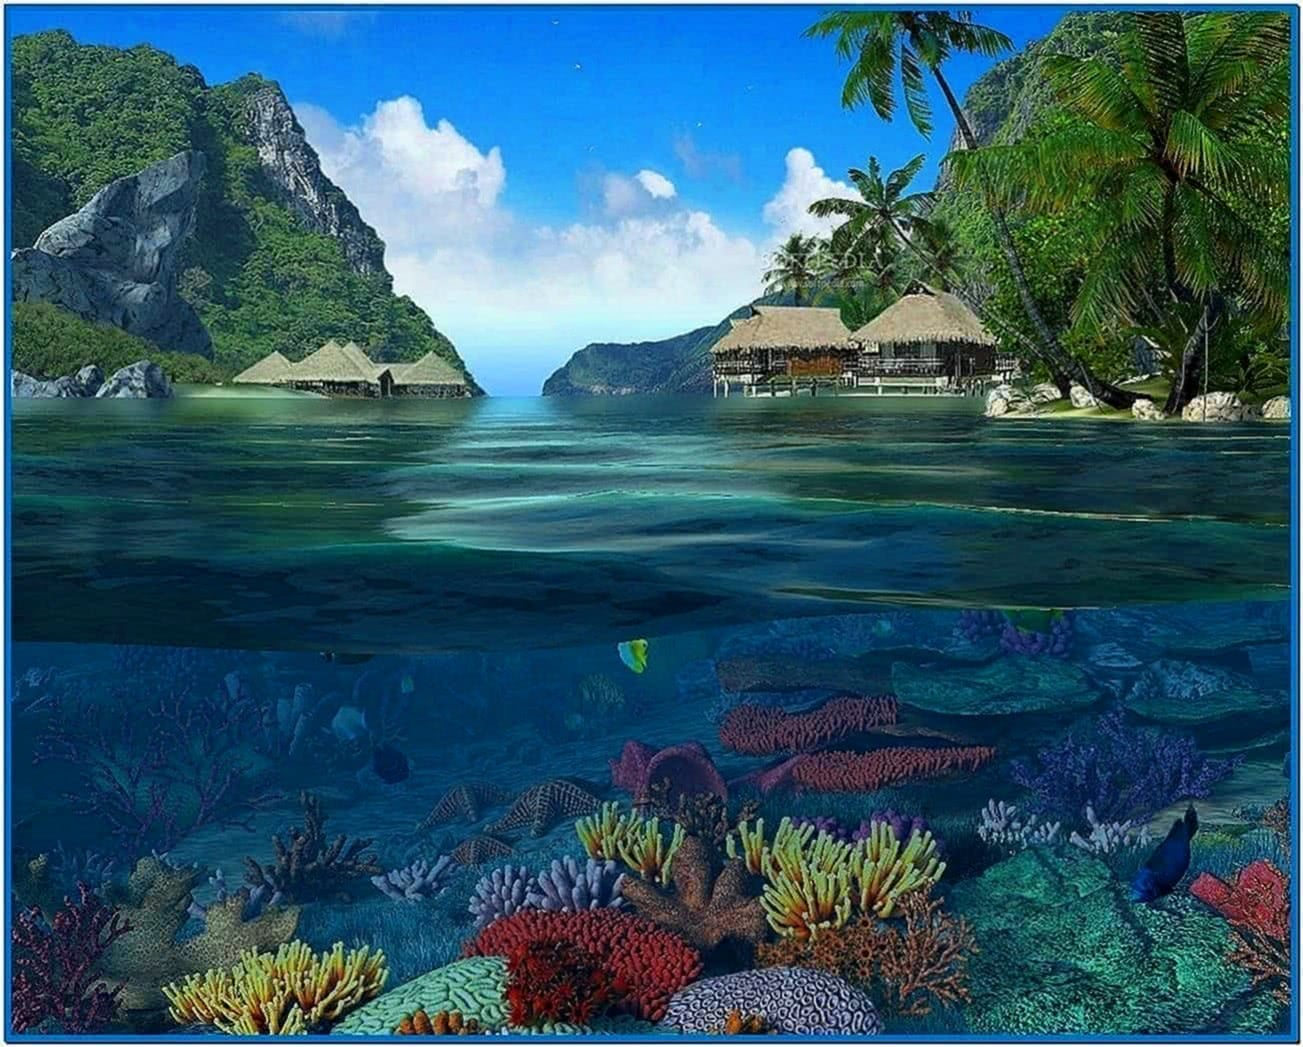 Caribbean Islands Screensaver